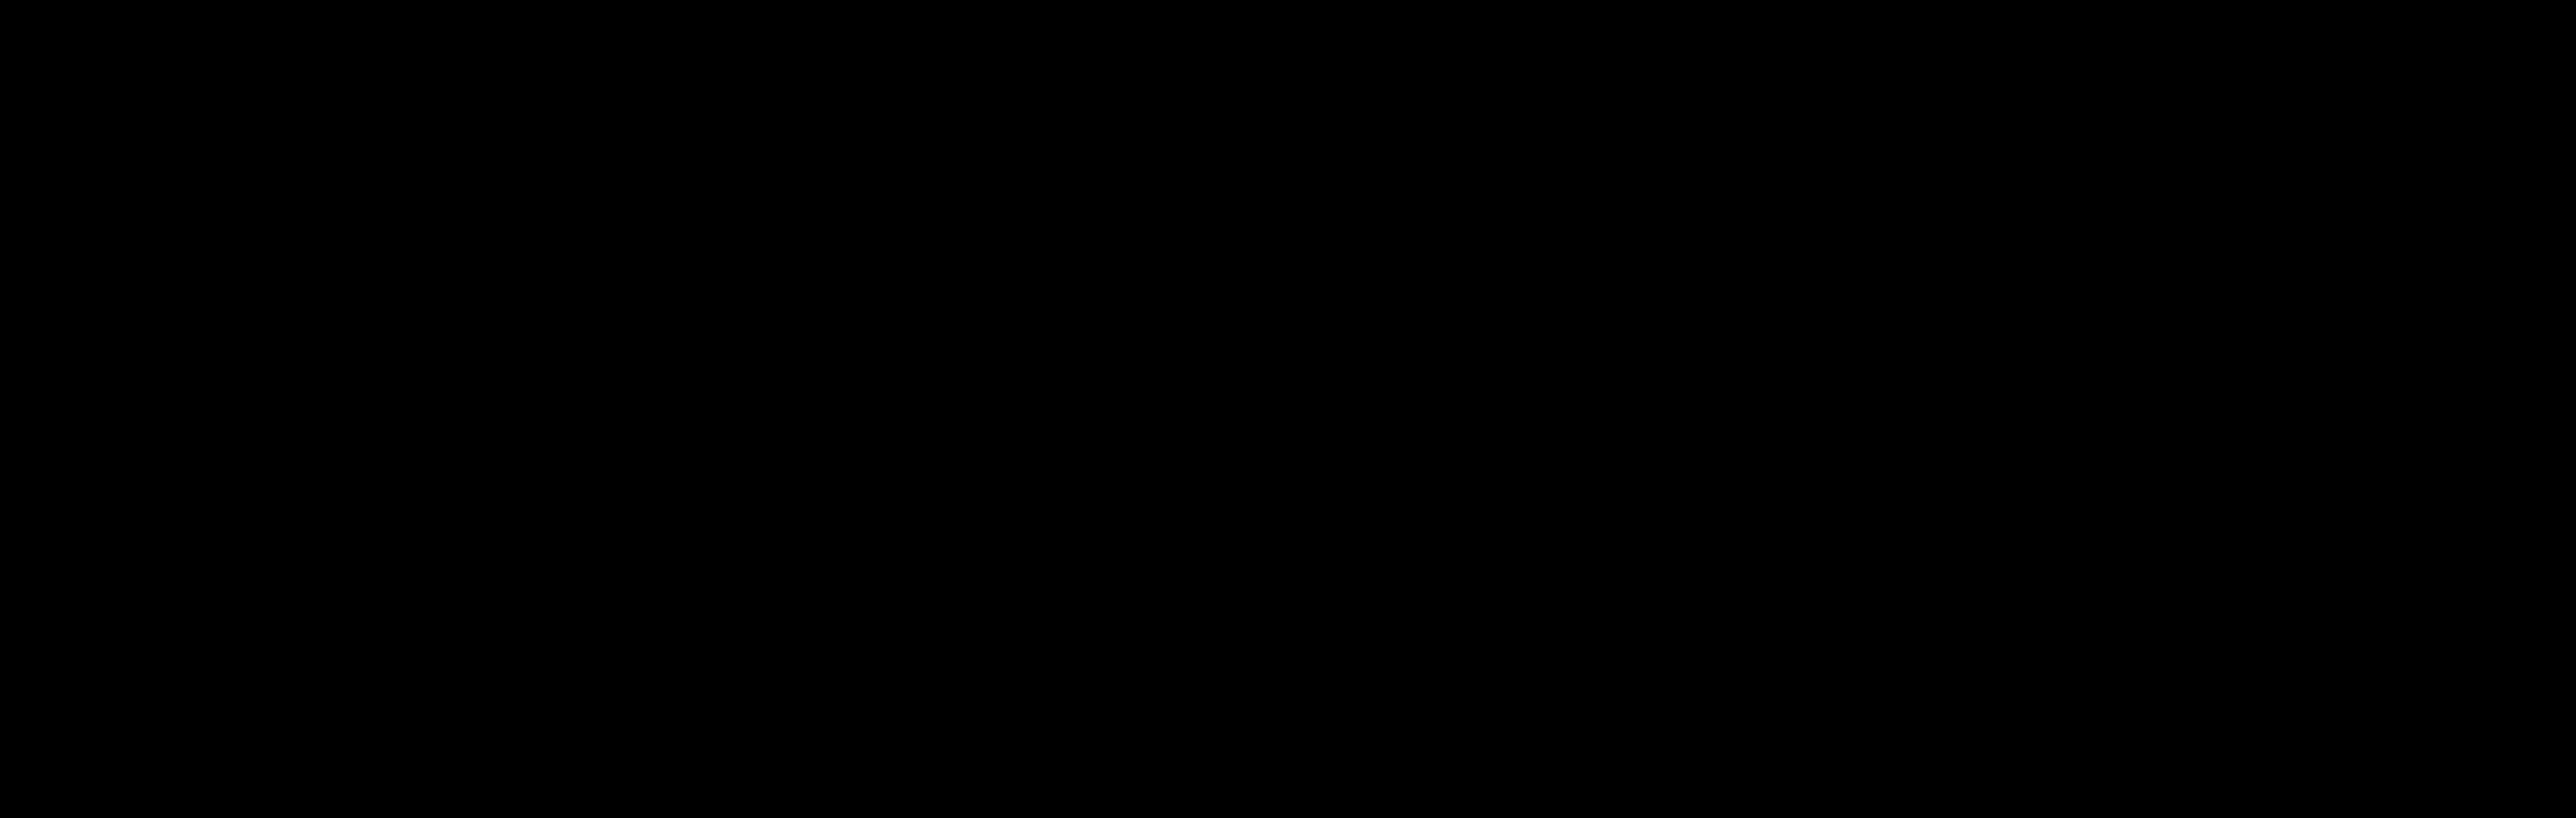 Variant – Commercial Trailer- 3018 P3 (459x180x93 cm)